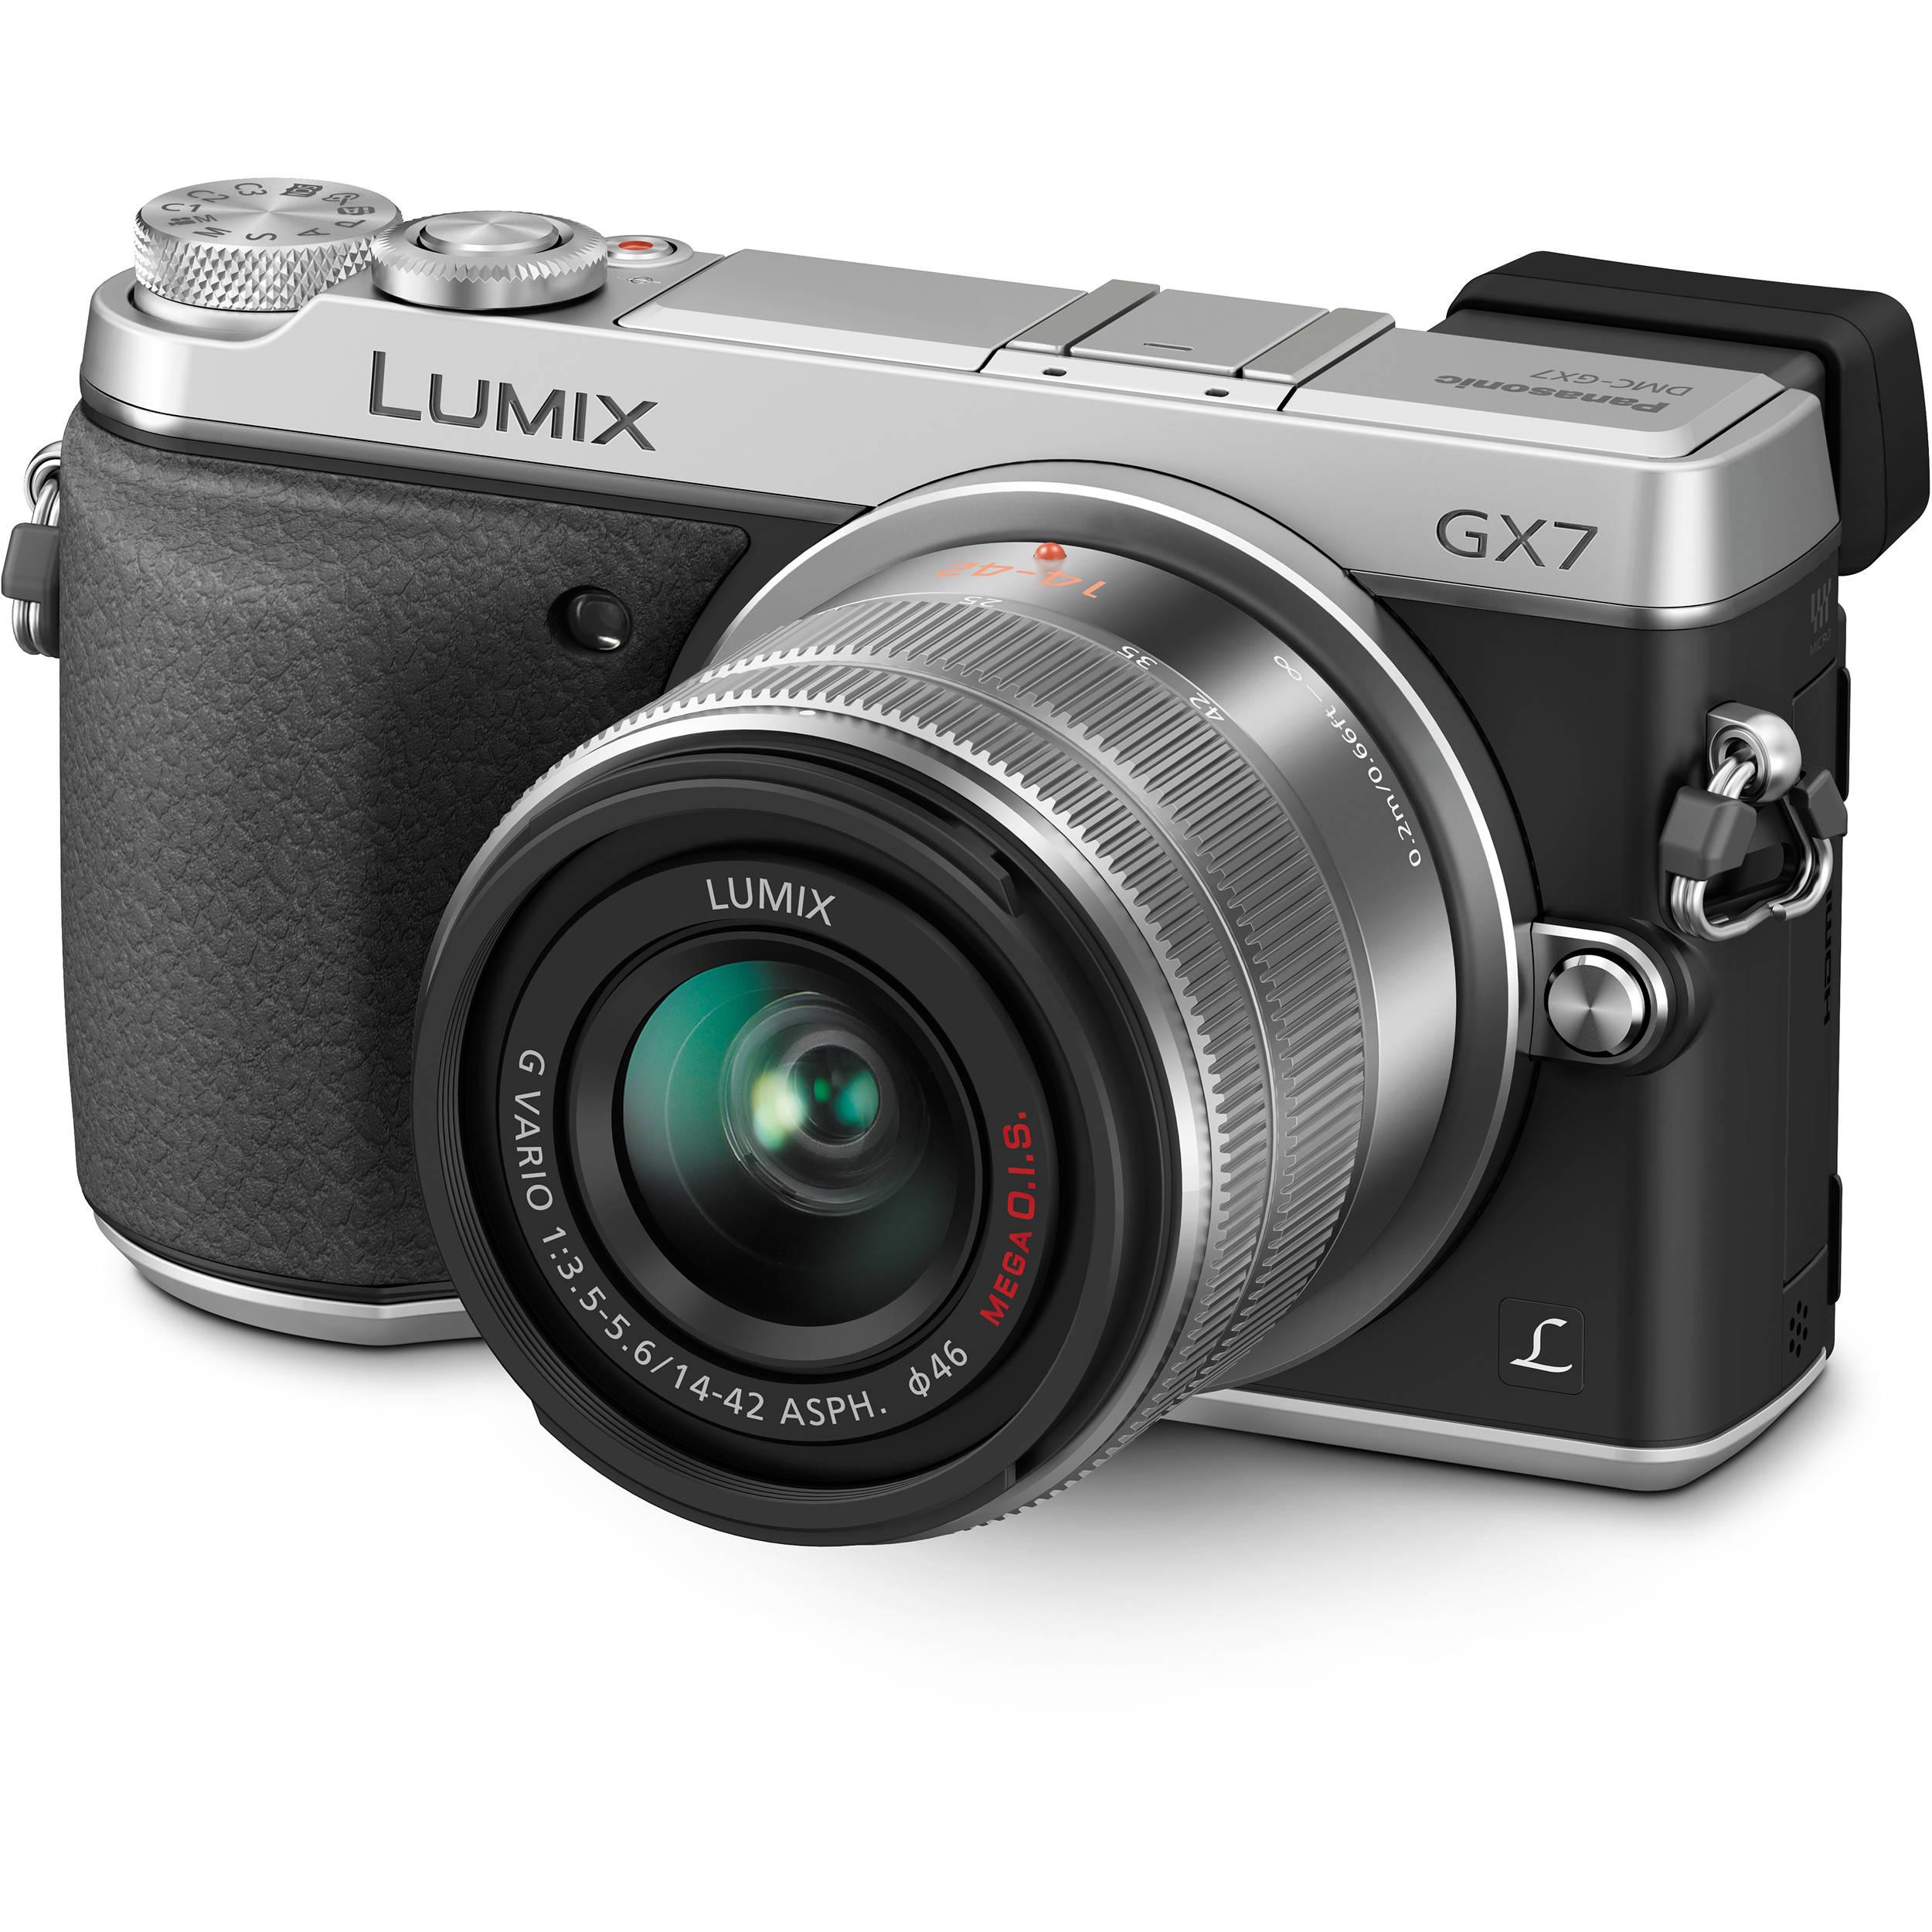 Panasonic Lumix DMC-GX7 Mirrorless Micro Four Thirds DMC-GX7KS